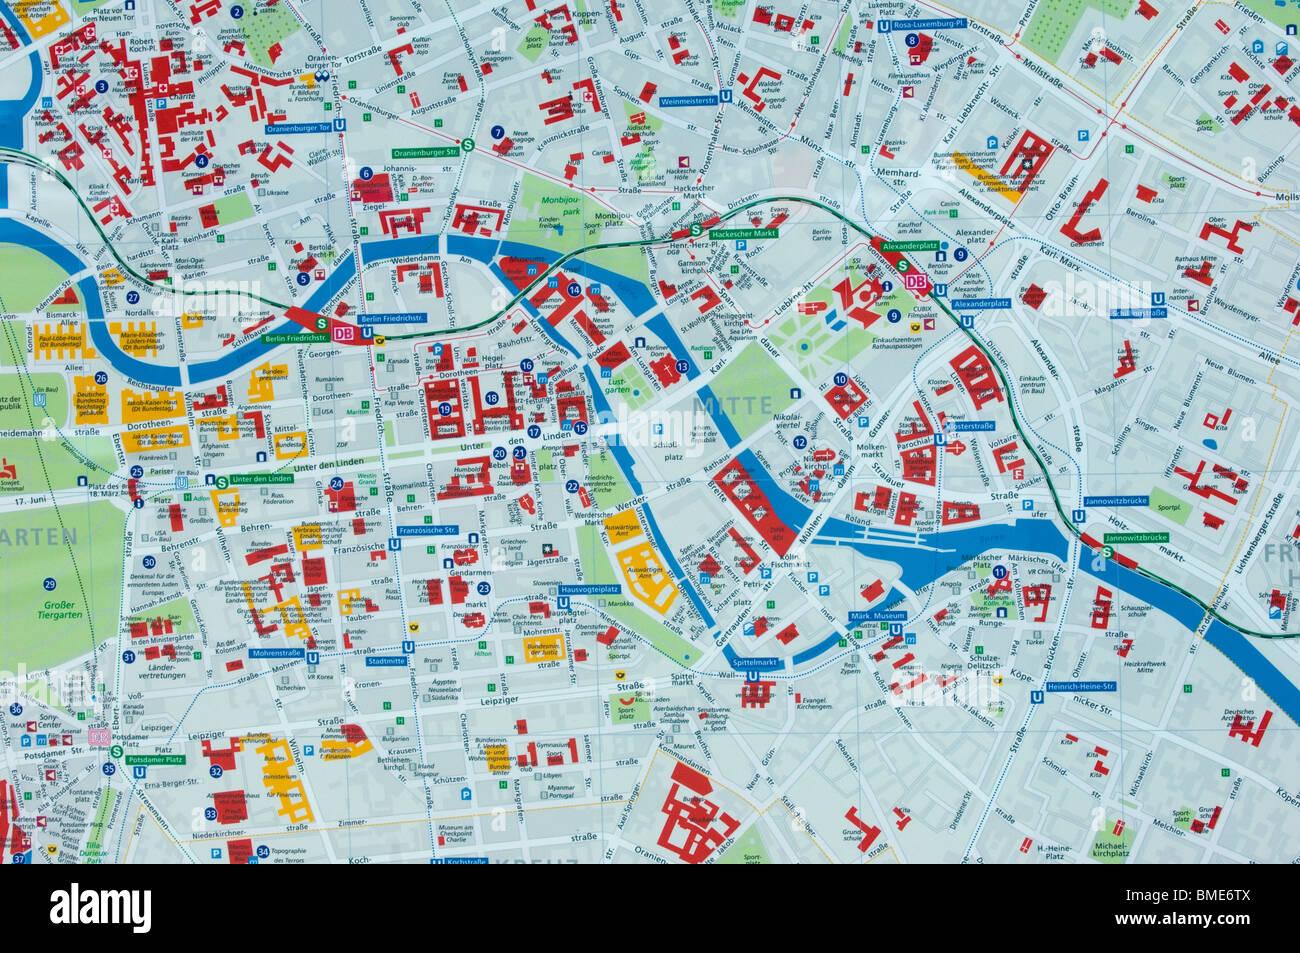 Berlin Mitte Information Map Berlin City Germany Stock Photo - Berlin mitte map